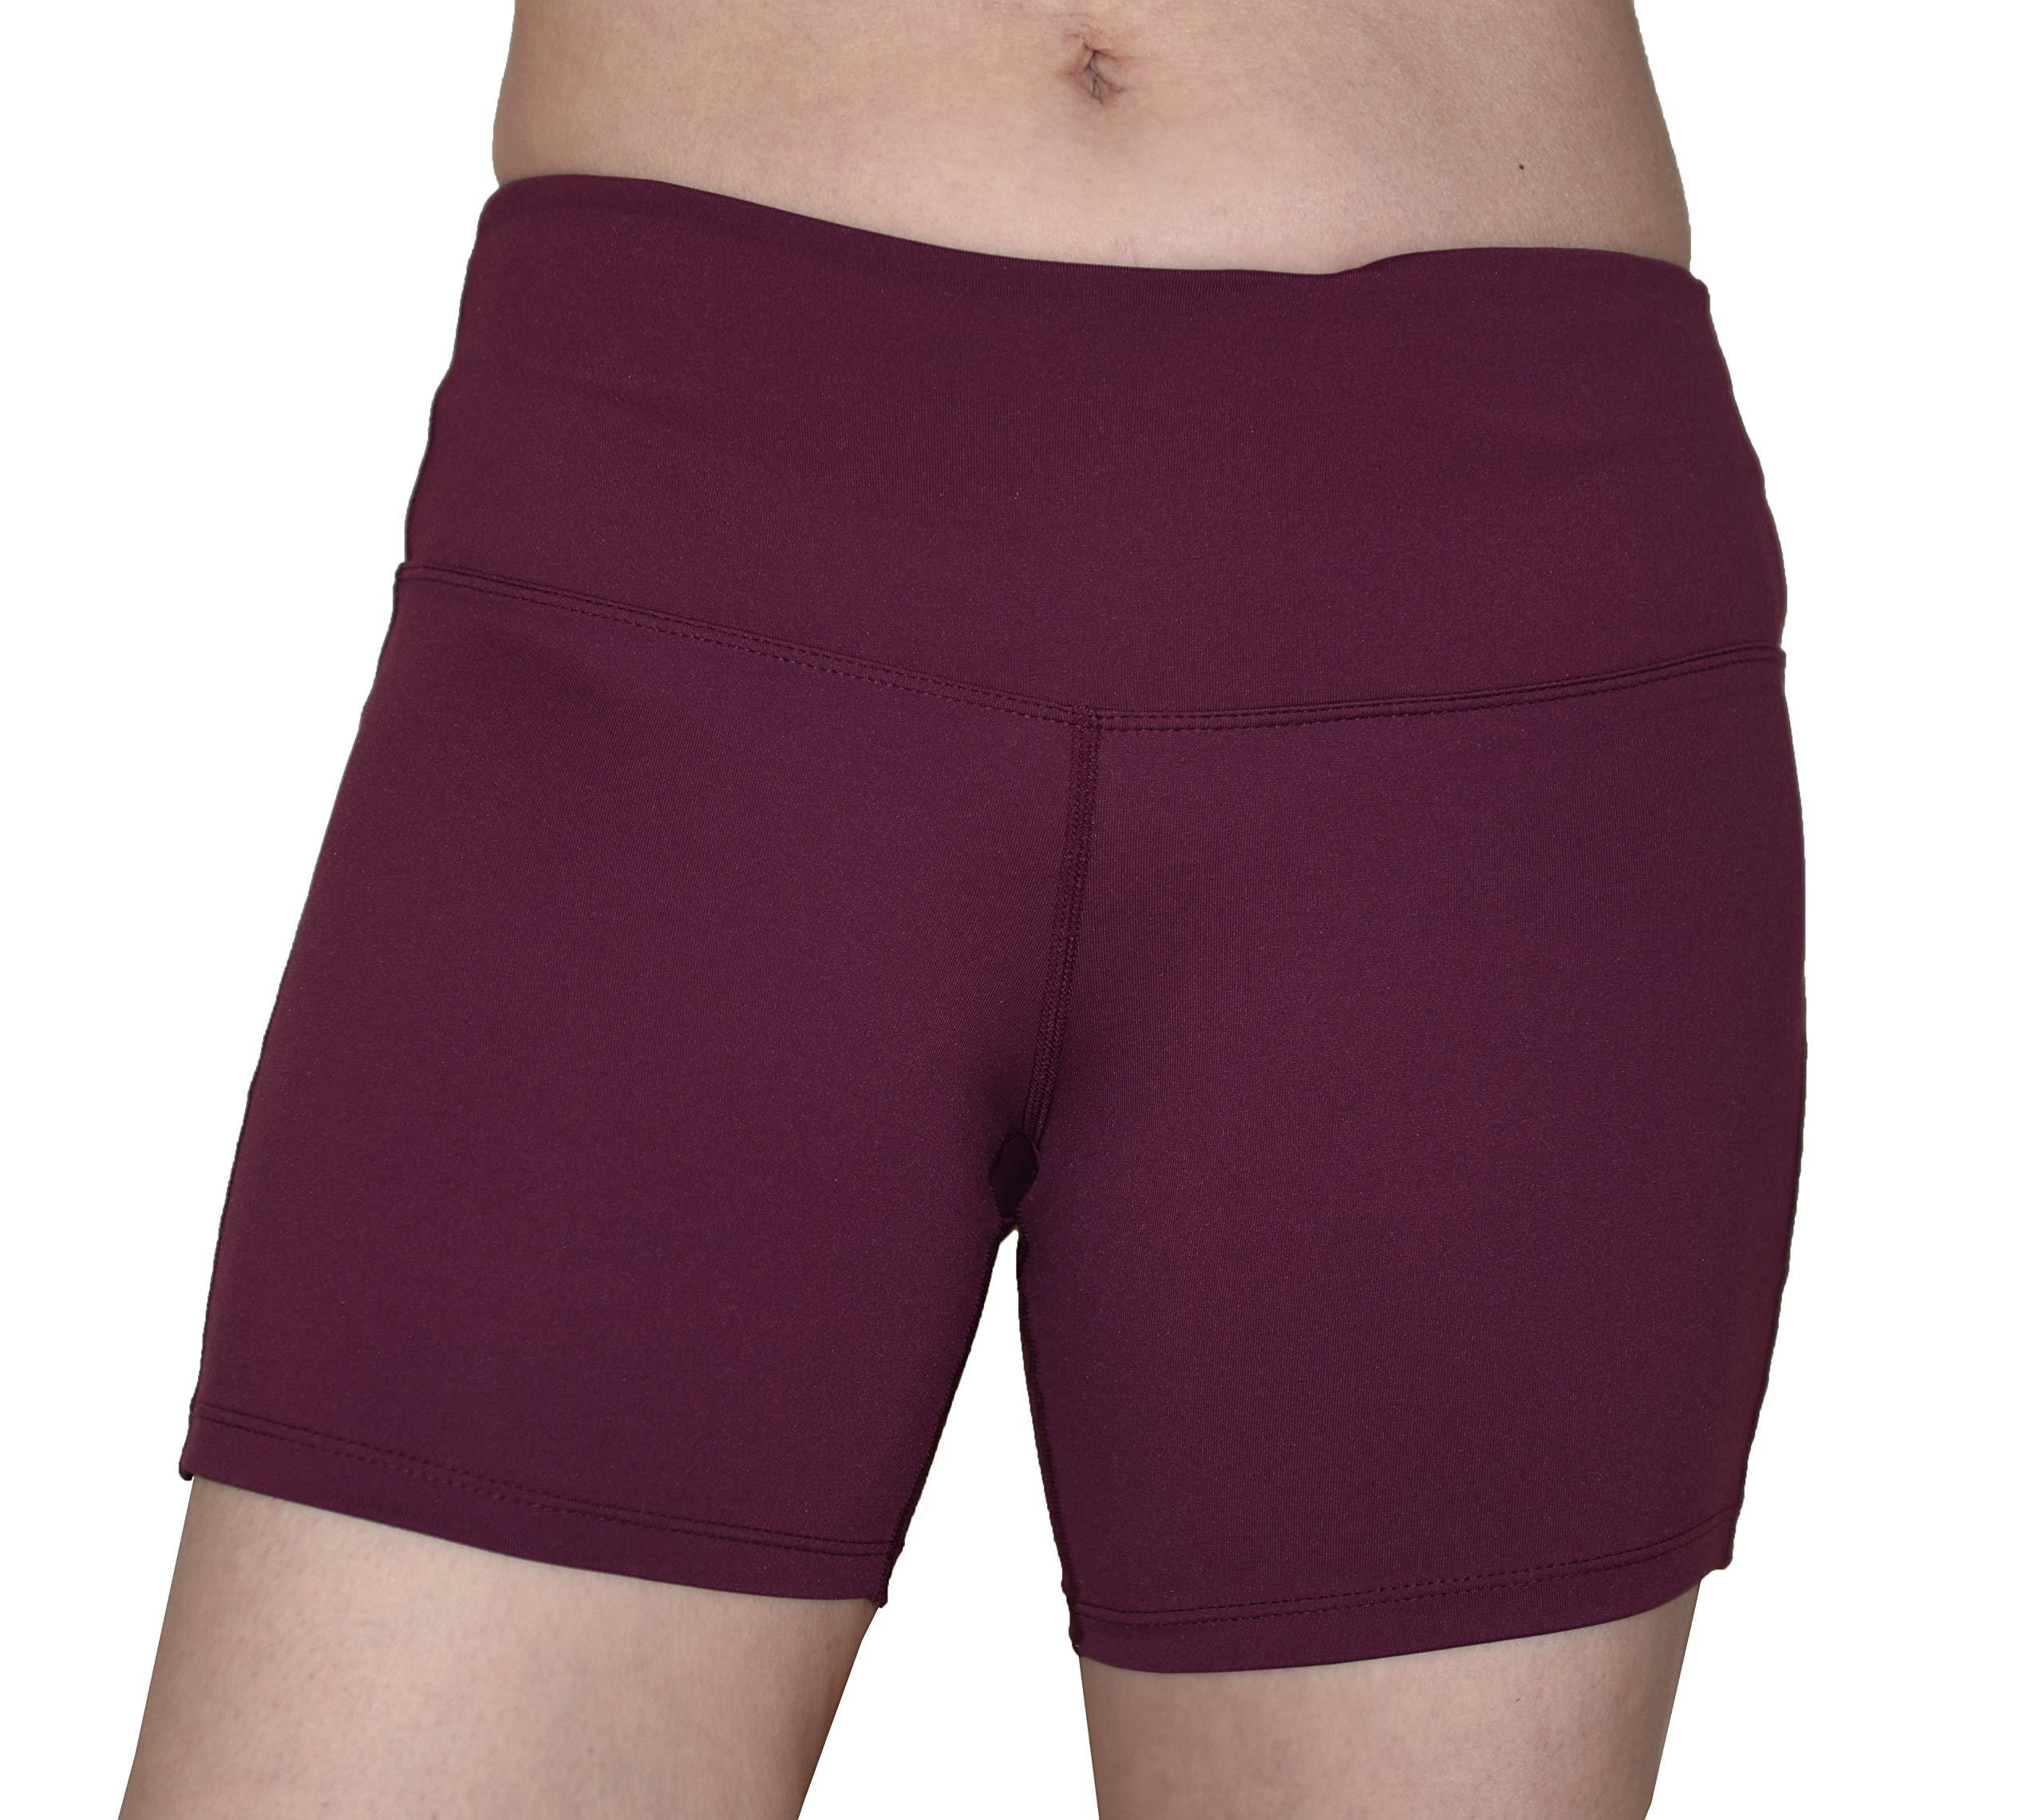 Private Island Women UV Swim Rash Guard Pockets Shorts Pants Yoga (XXL, DWine) by Private Island